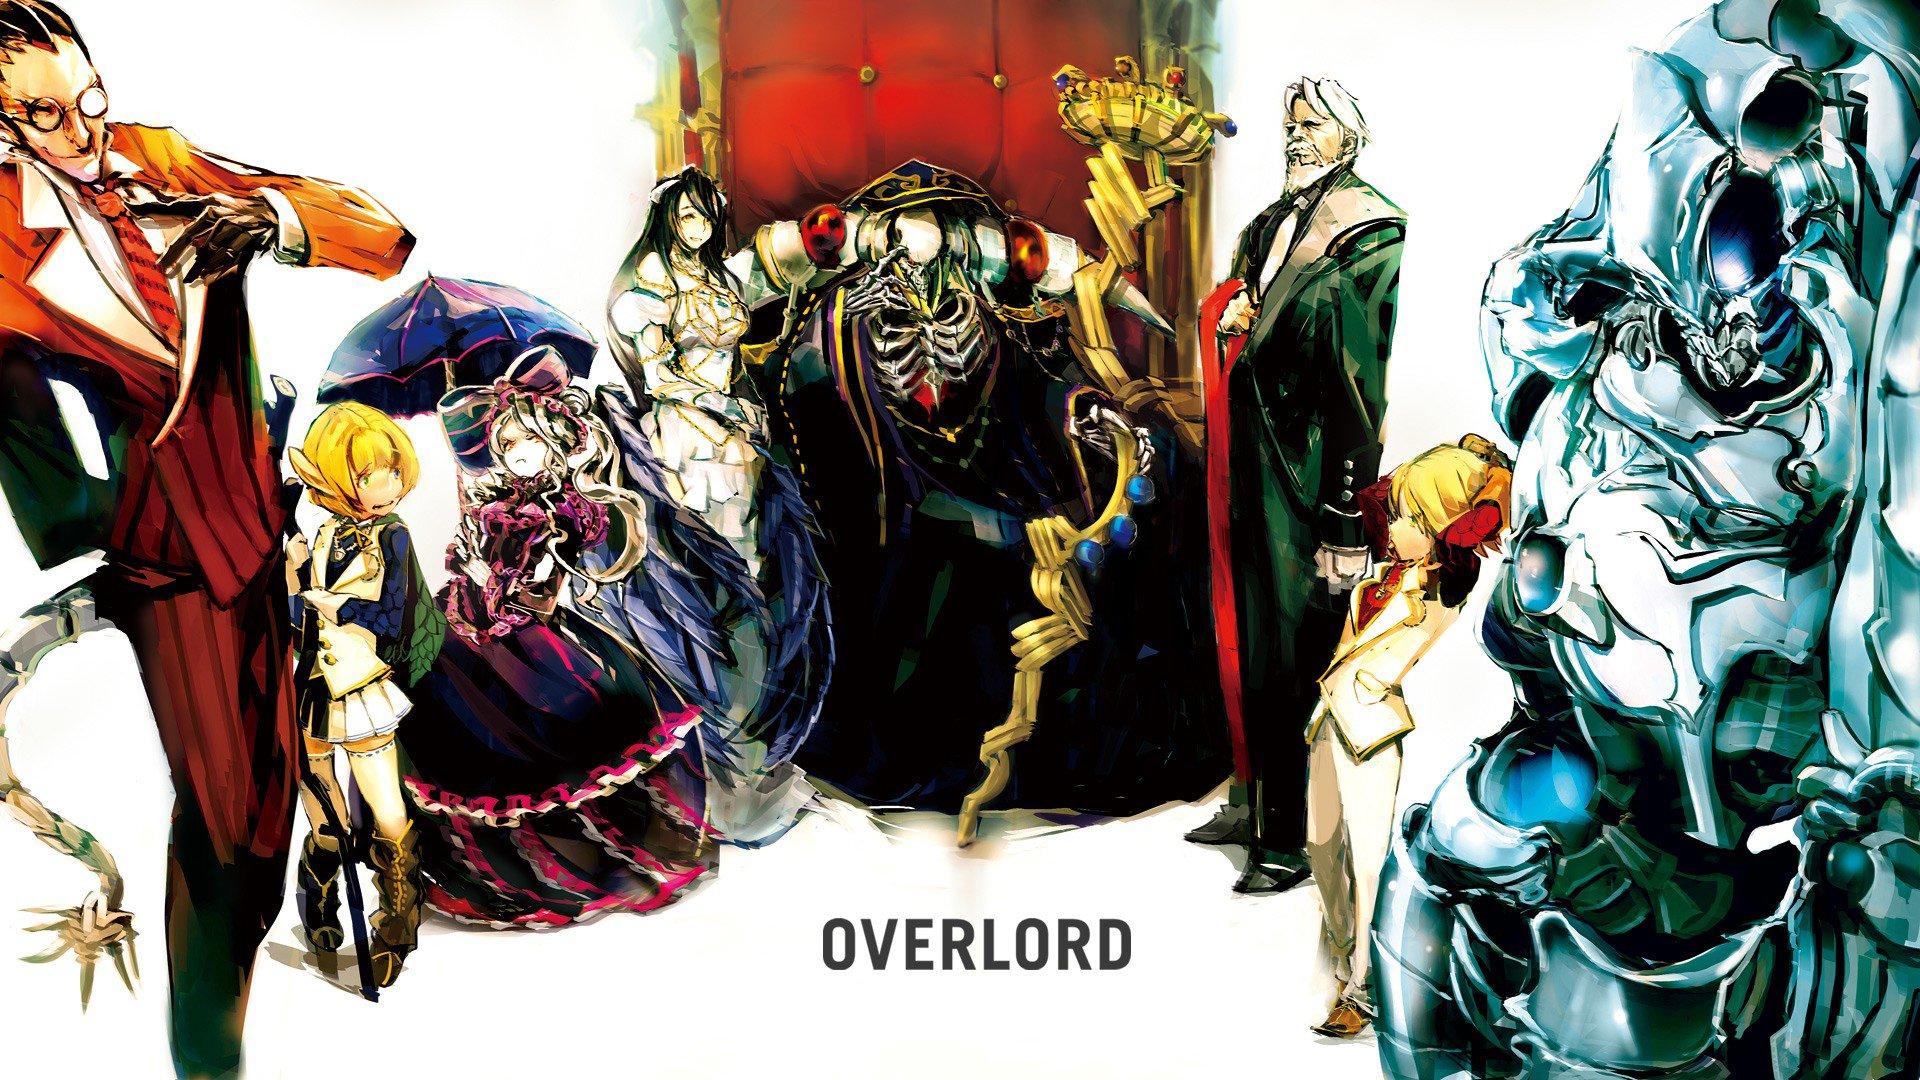 Hd Wallpaper - Overlord Wallpaper Anime Hd , HD Wallpaper & Backgrounds